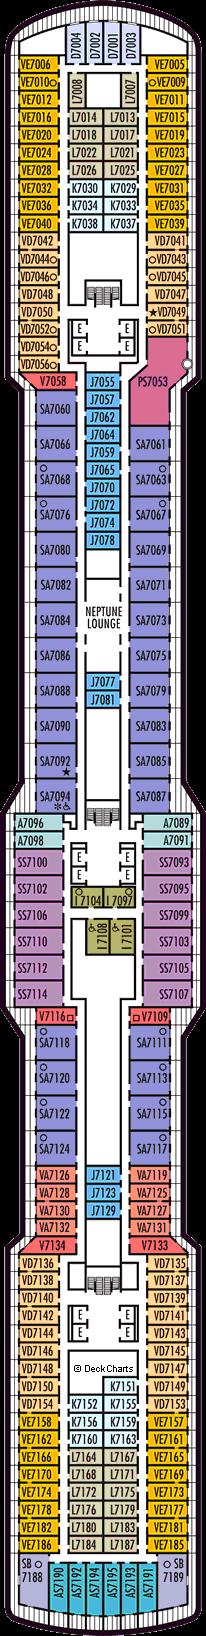 Koningsdam: Schubert Deck